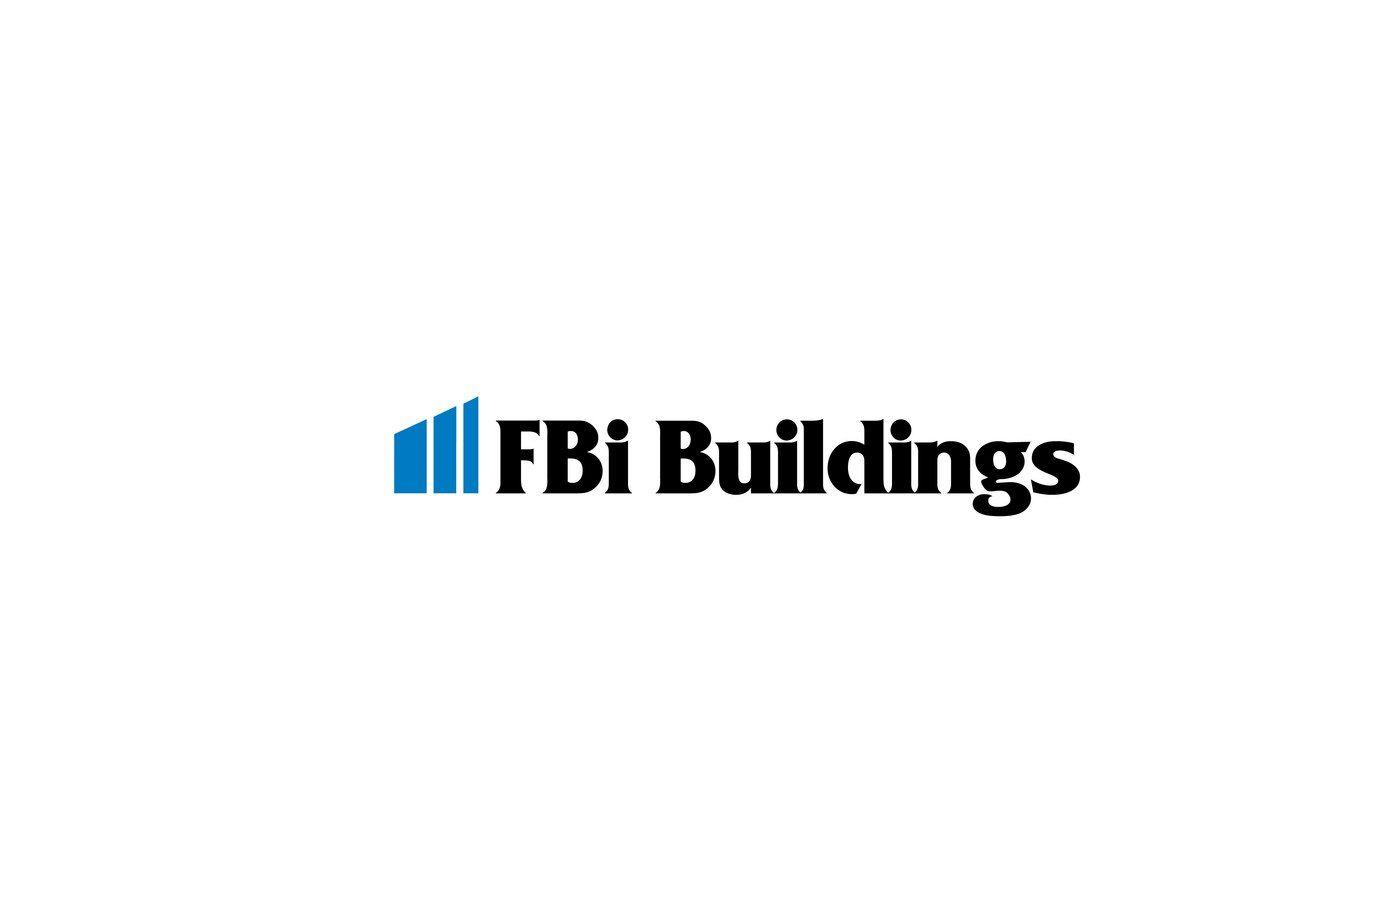 Summit_About Us_FBi Buildings-01